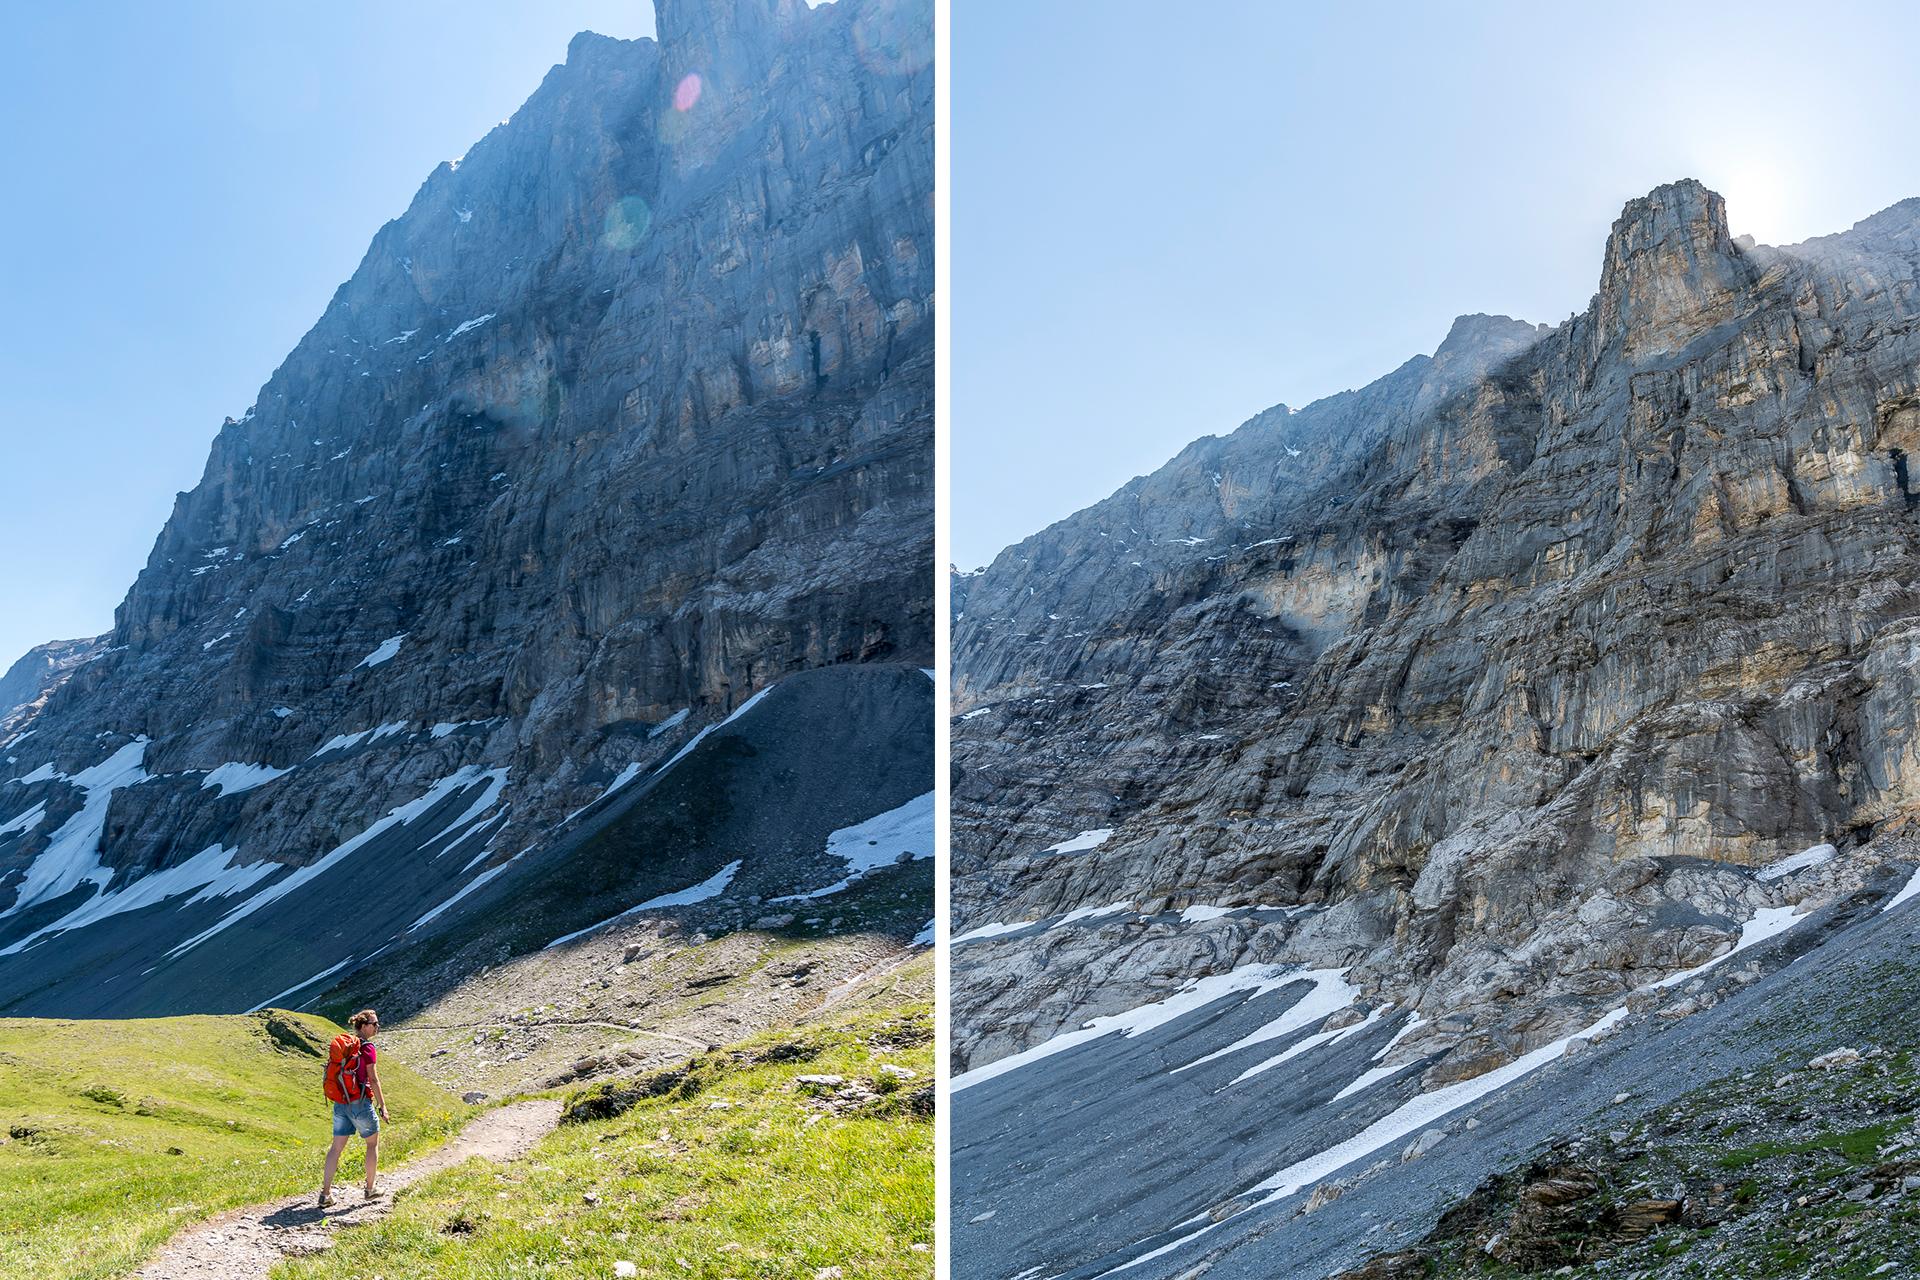 Eiger Trail Jungfrauregion